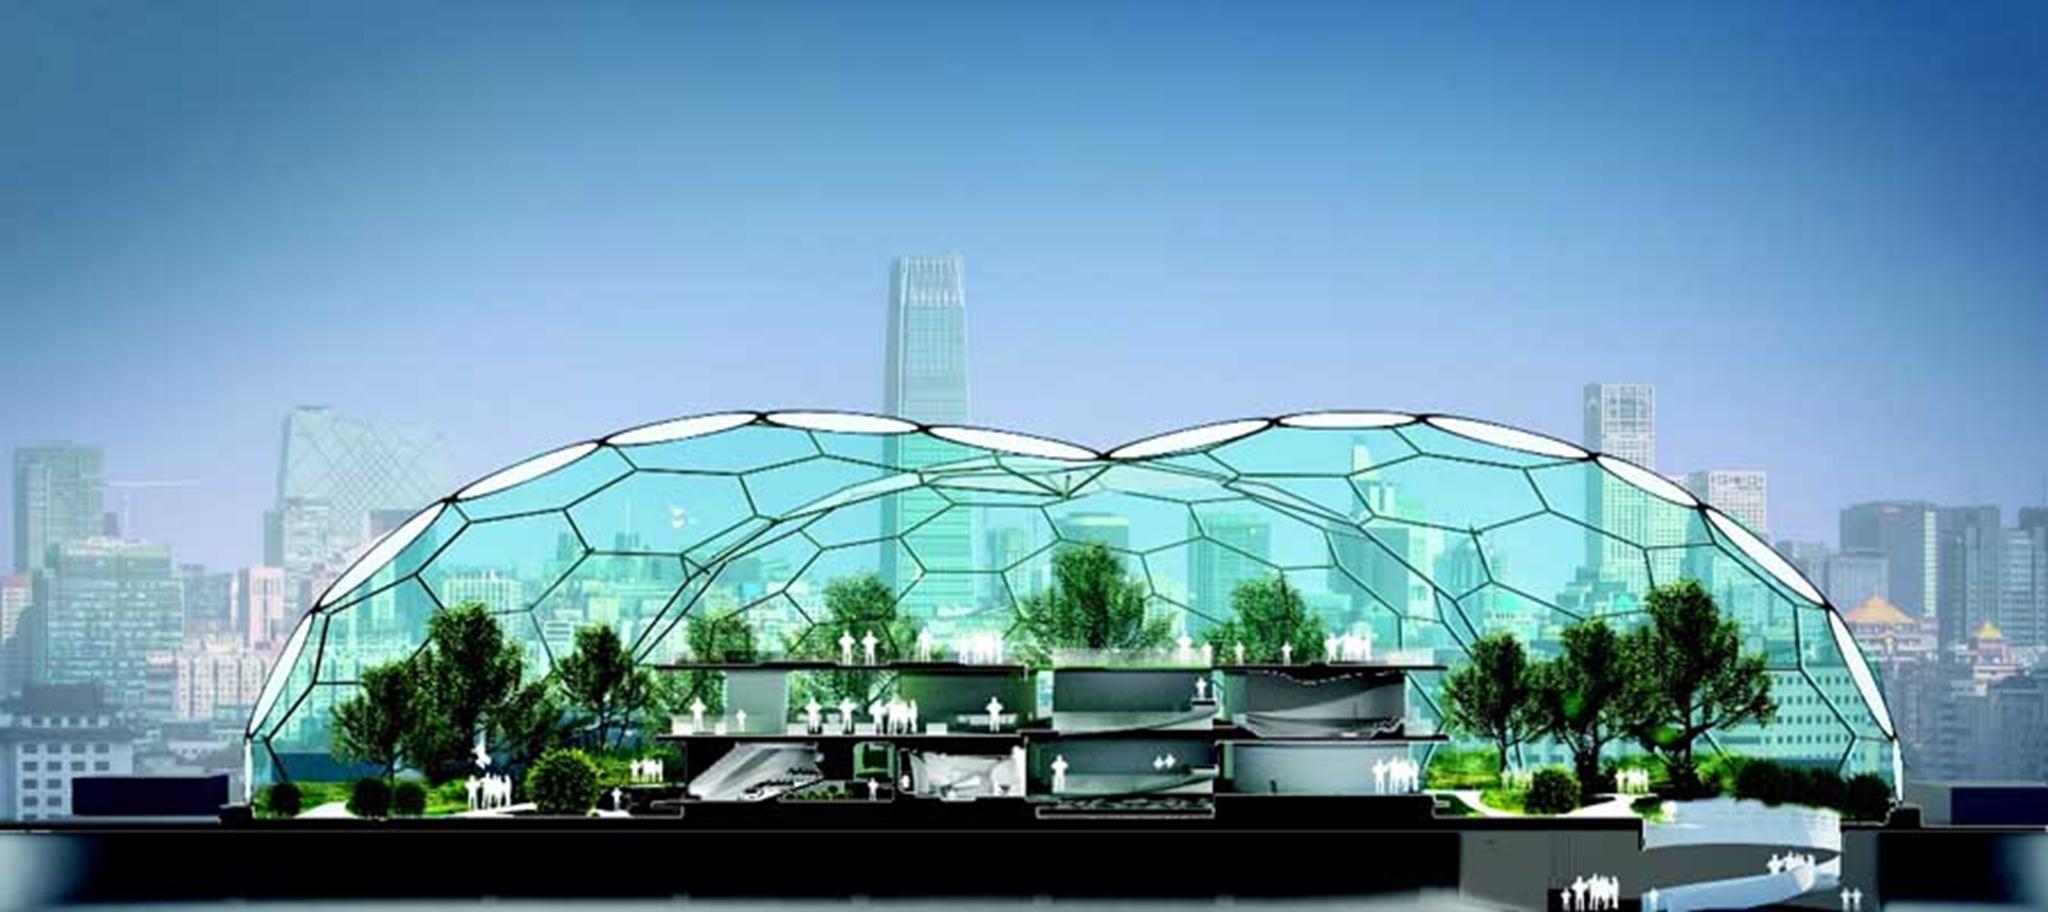 home_of_the_future_l220311_4